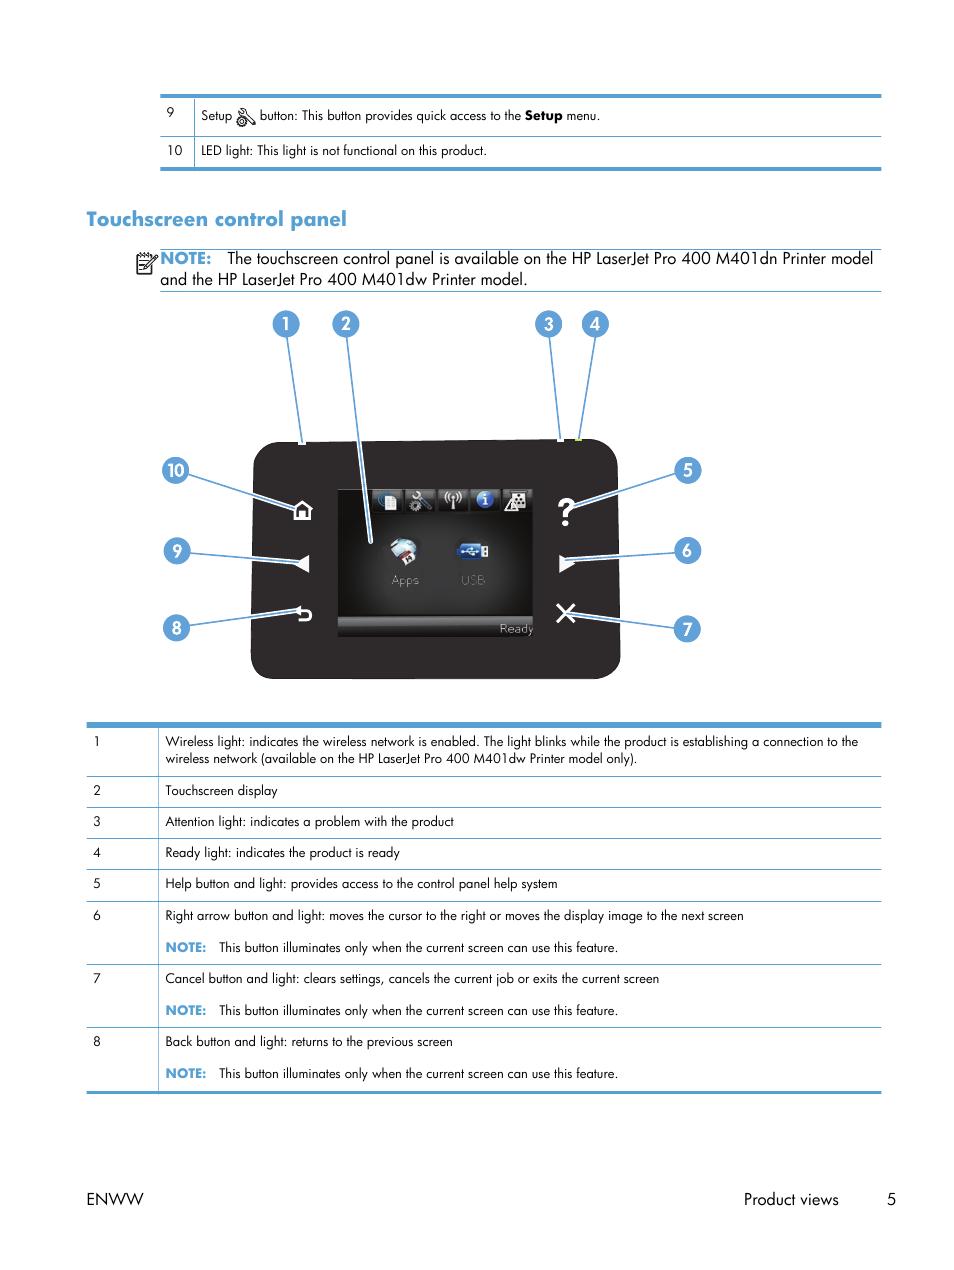 Touchscreen control panel   HP LaserJet Pro 400 Printer M401 series User  Manual   Page 17